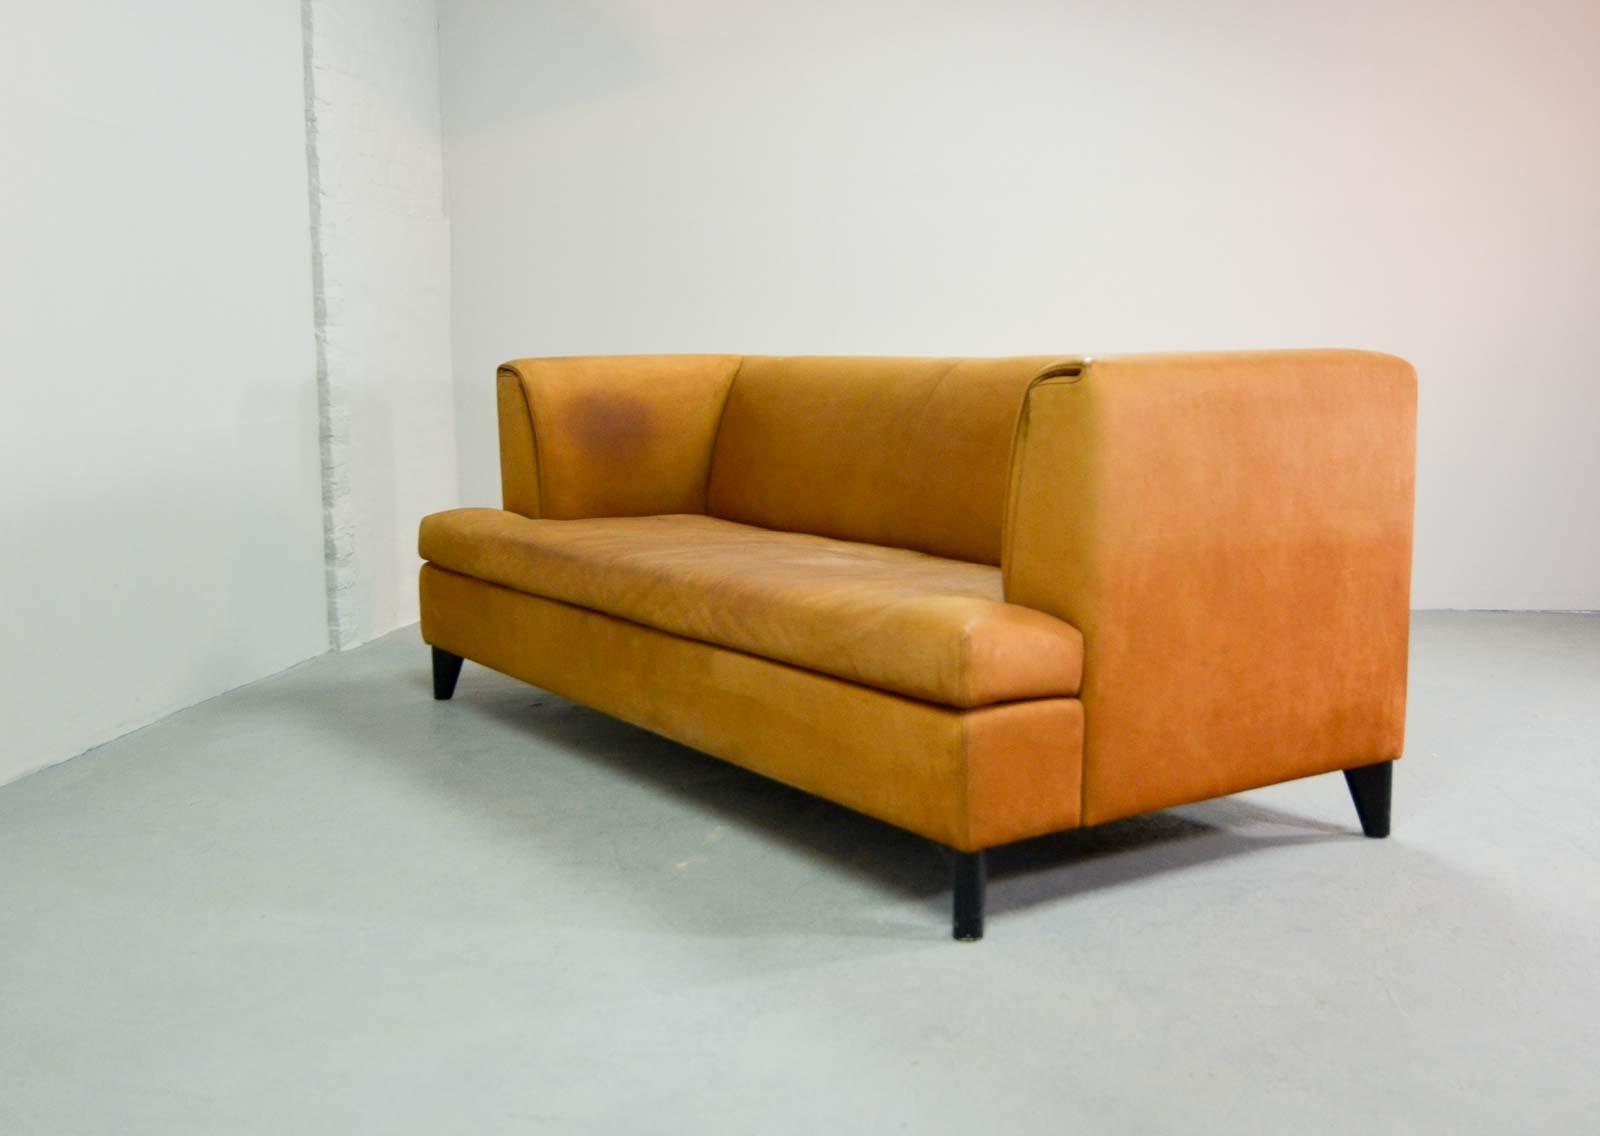 sofa wittmann elegant wonderful seater sofa with sofa wittmann wittmann chair wittmann chair. Black Bedroom Furniture Sets. Home Design Ideas